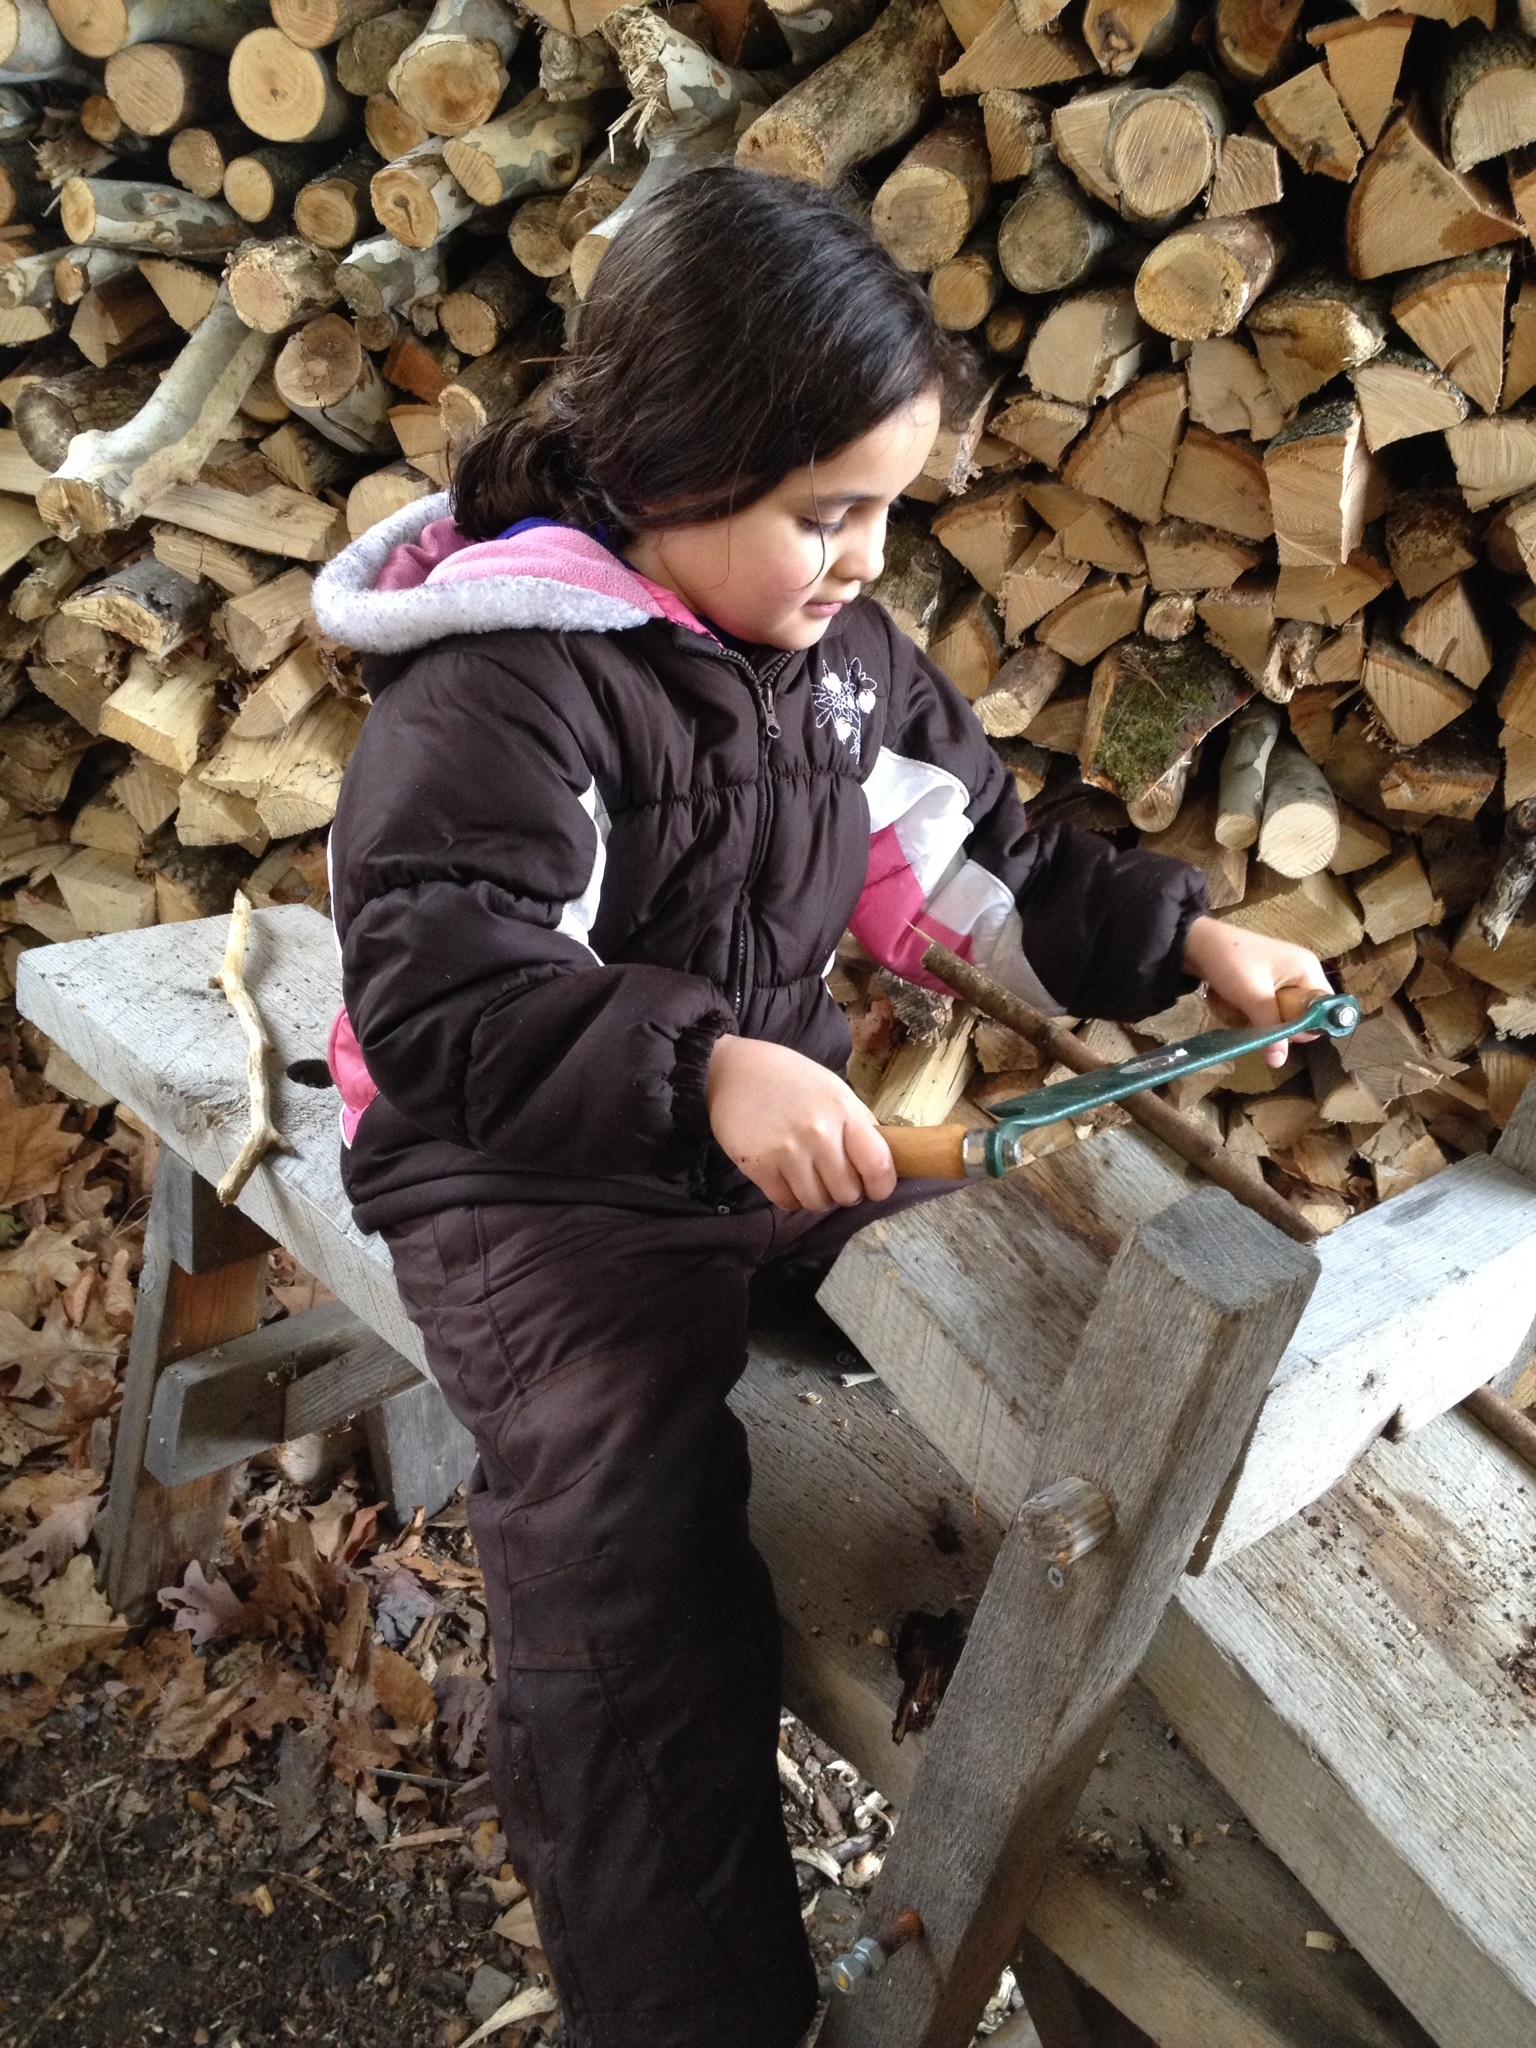 Wood Carving, Maple Sugar Family Weekend